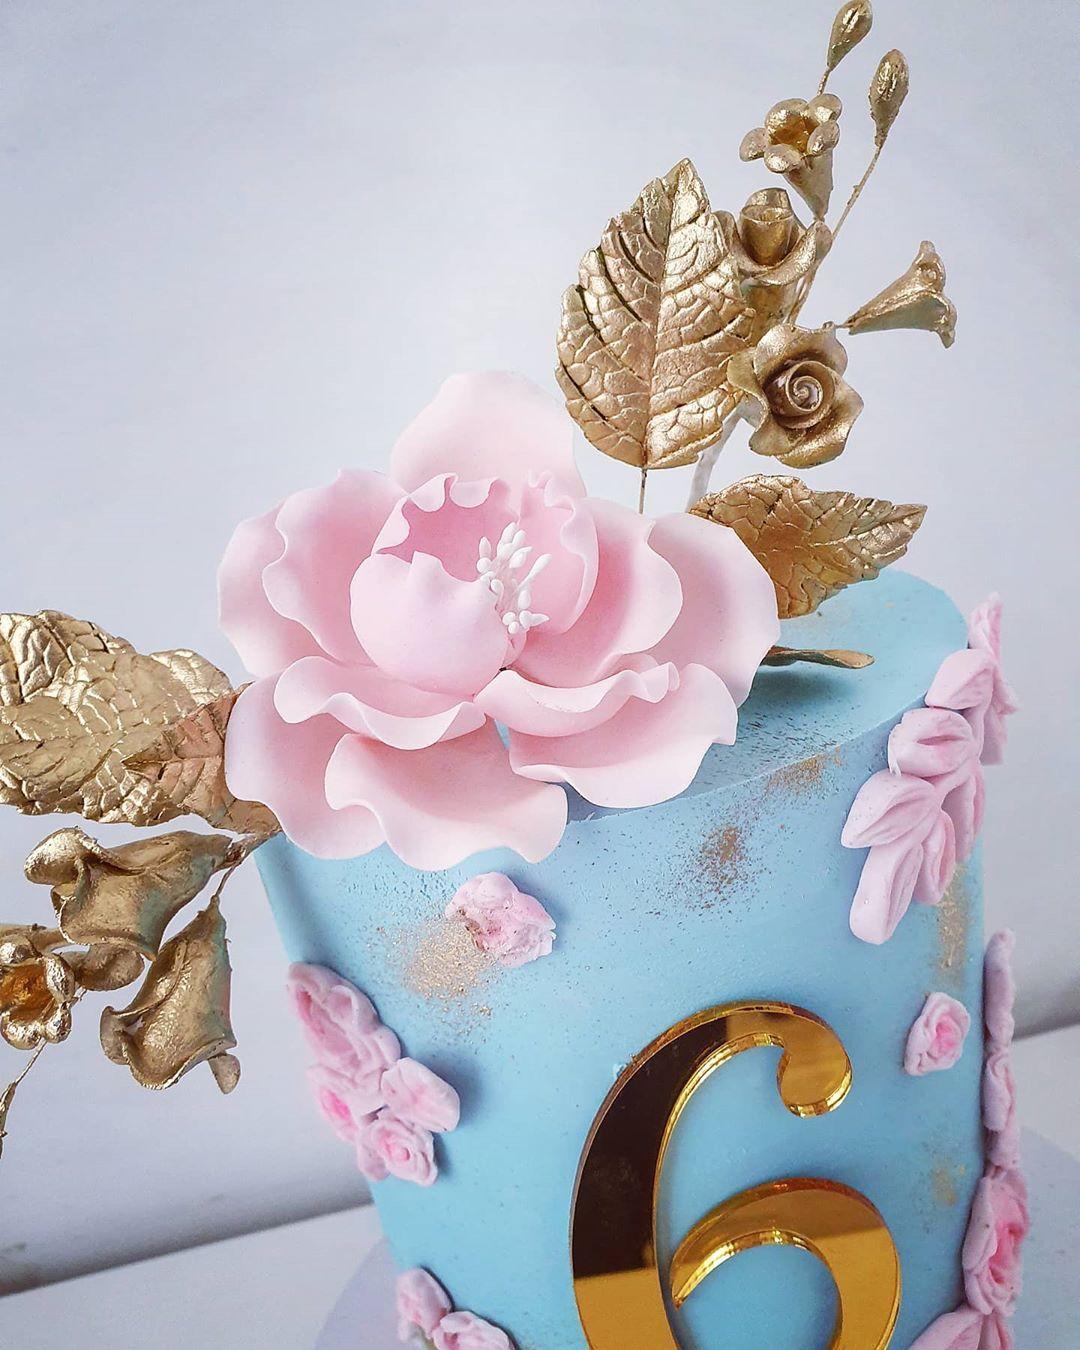 "C A K E S   B Y   H A N A N on Instagram: ""💗💗💗 . . . . #cake_me_pretty #instalove #instadaily #instalike #instagramhub #igers #sweet16 #food #instamood #instago #cakes #foodie…"""